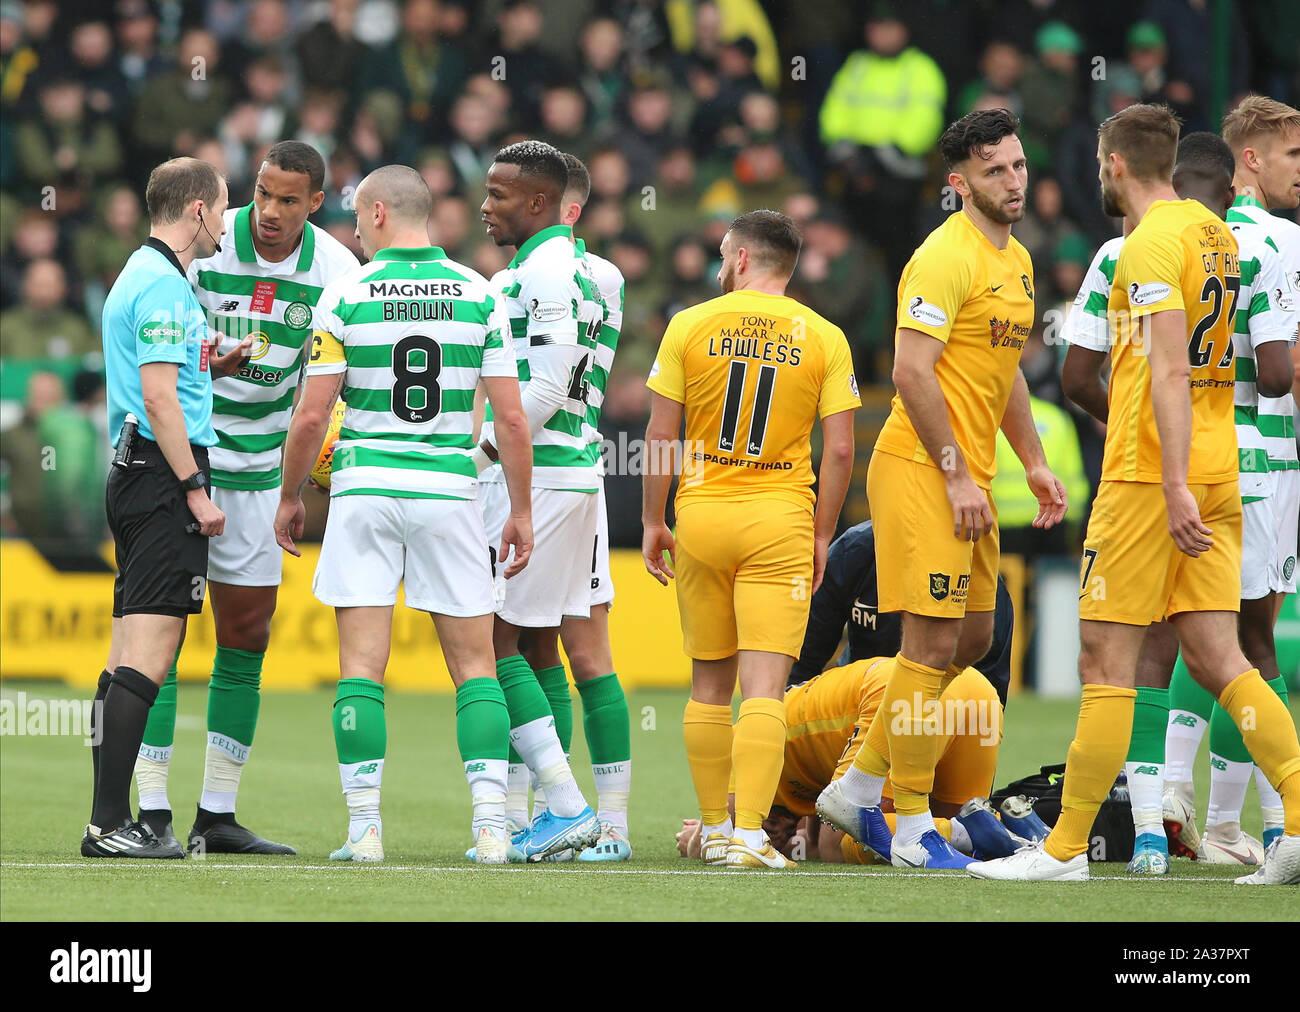 Livingston Scotland Uk 6th Oct 2019 Scottish Premiership Livingston Football Club Versus Celtic The Celtic Players